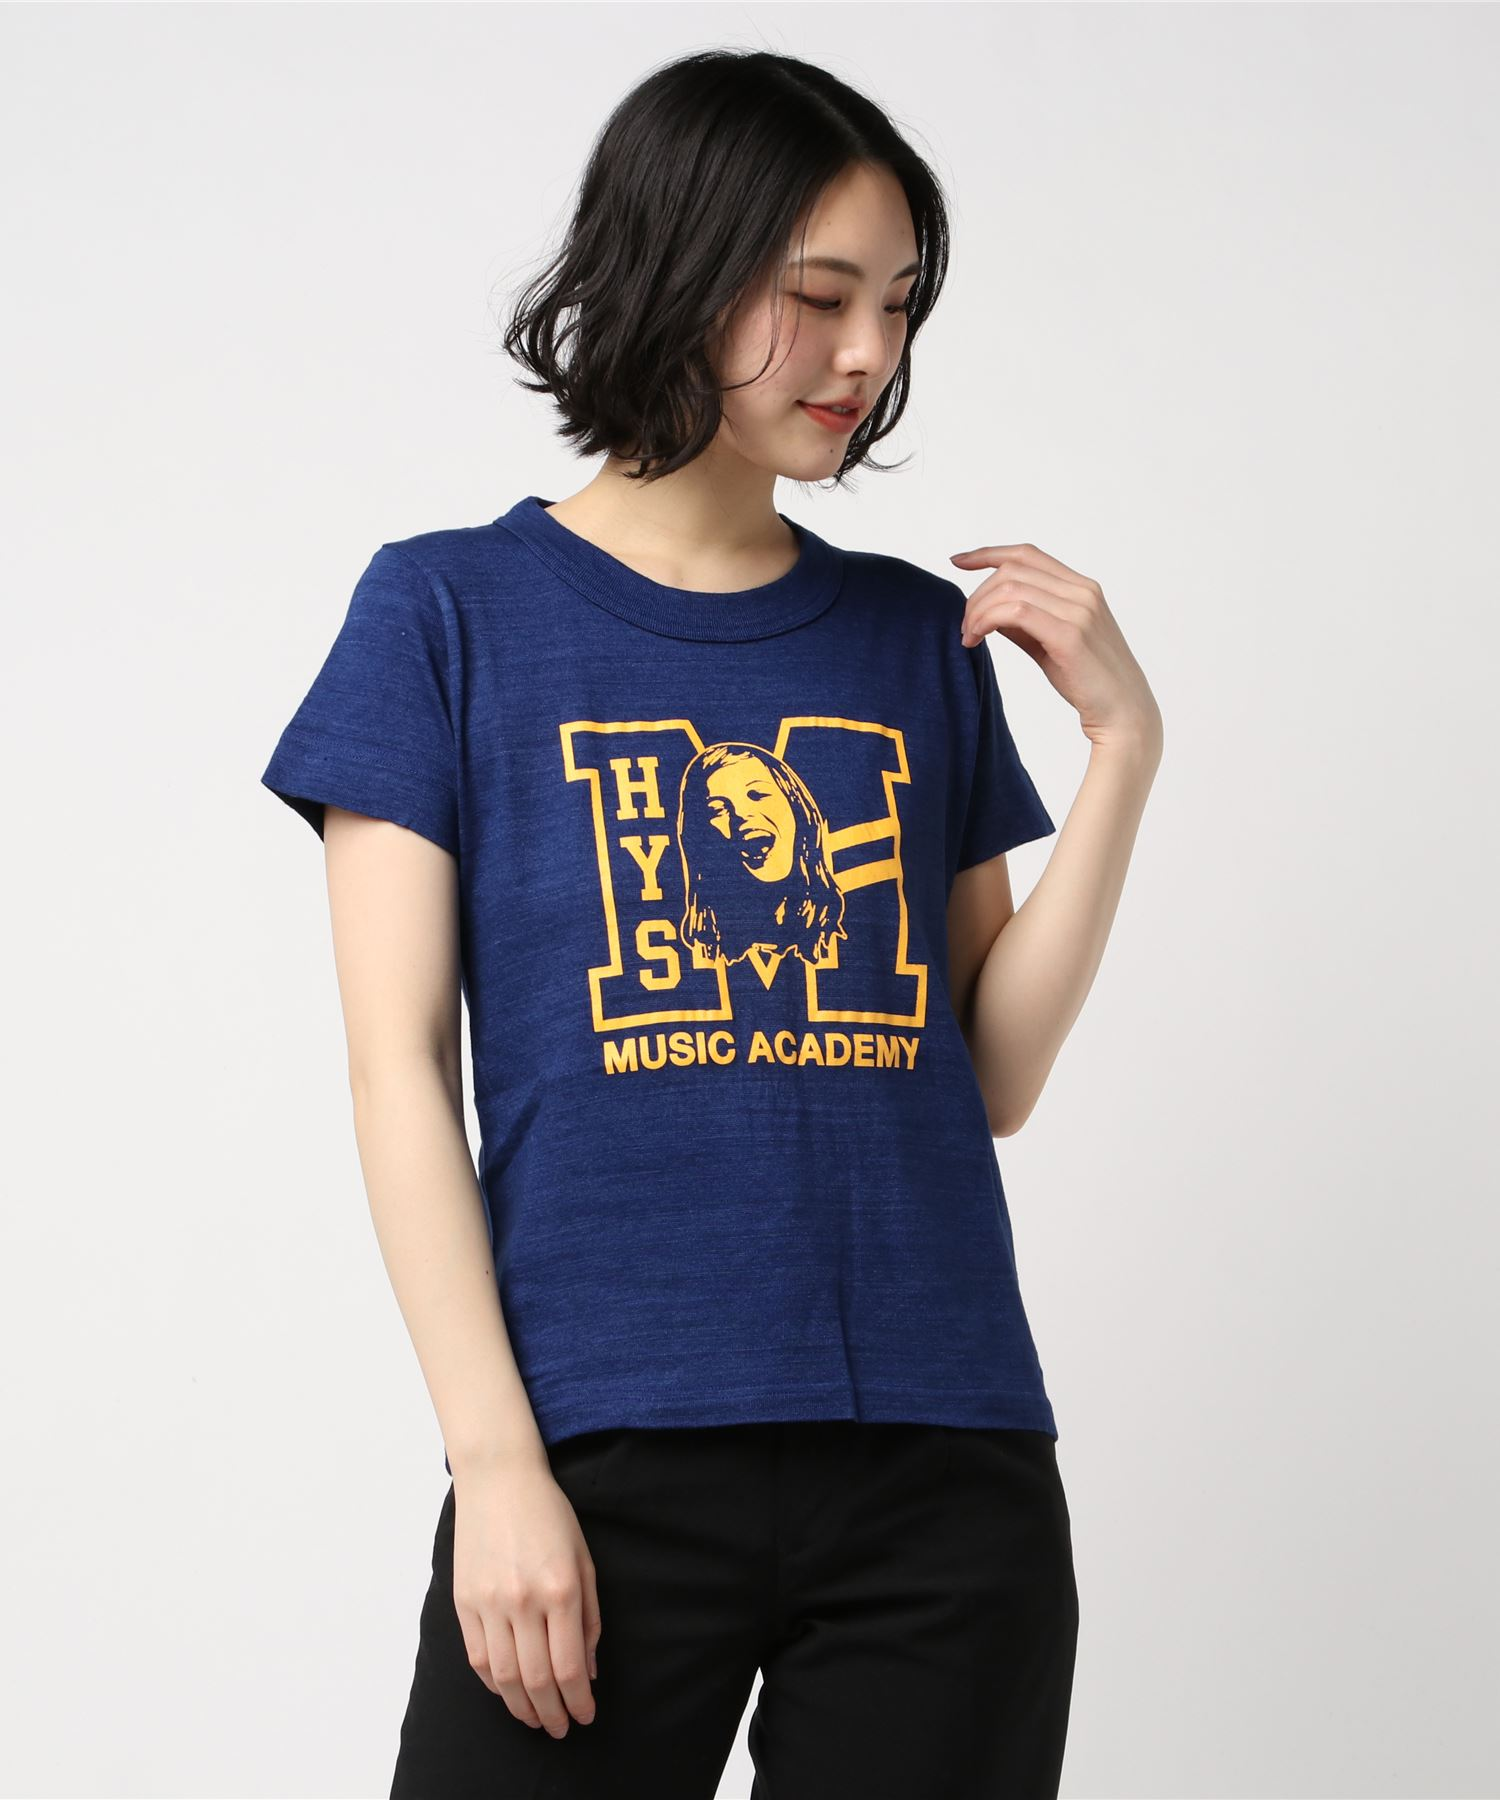 MUSIC ACADEMY Tシャツ